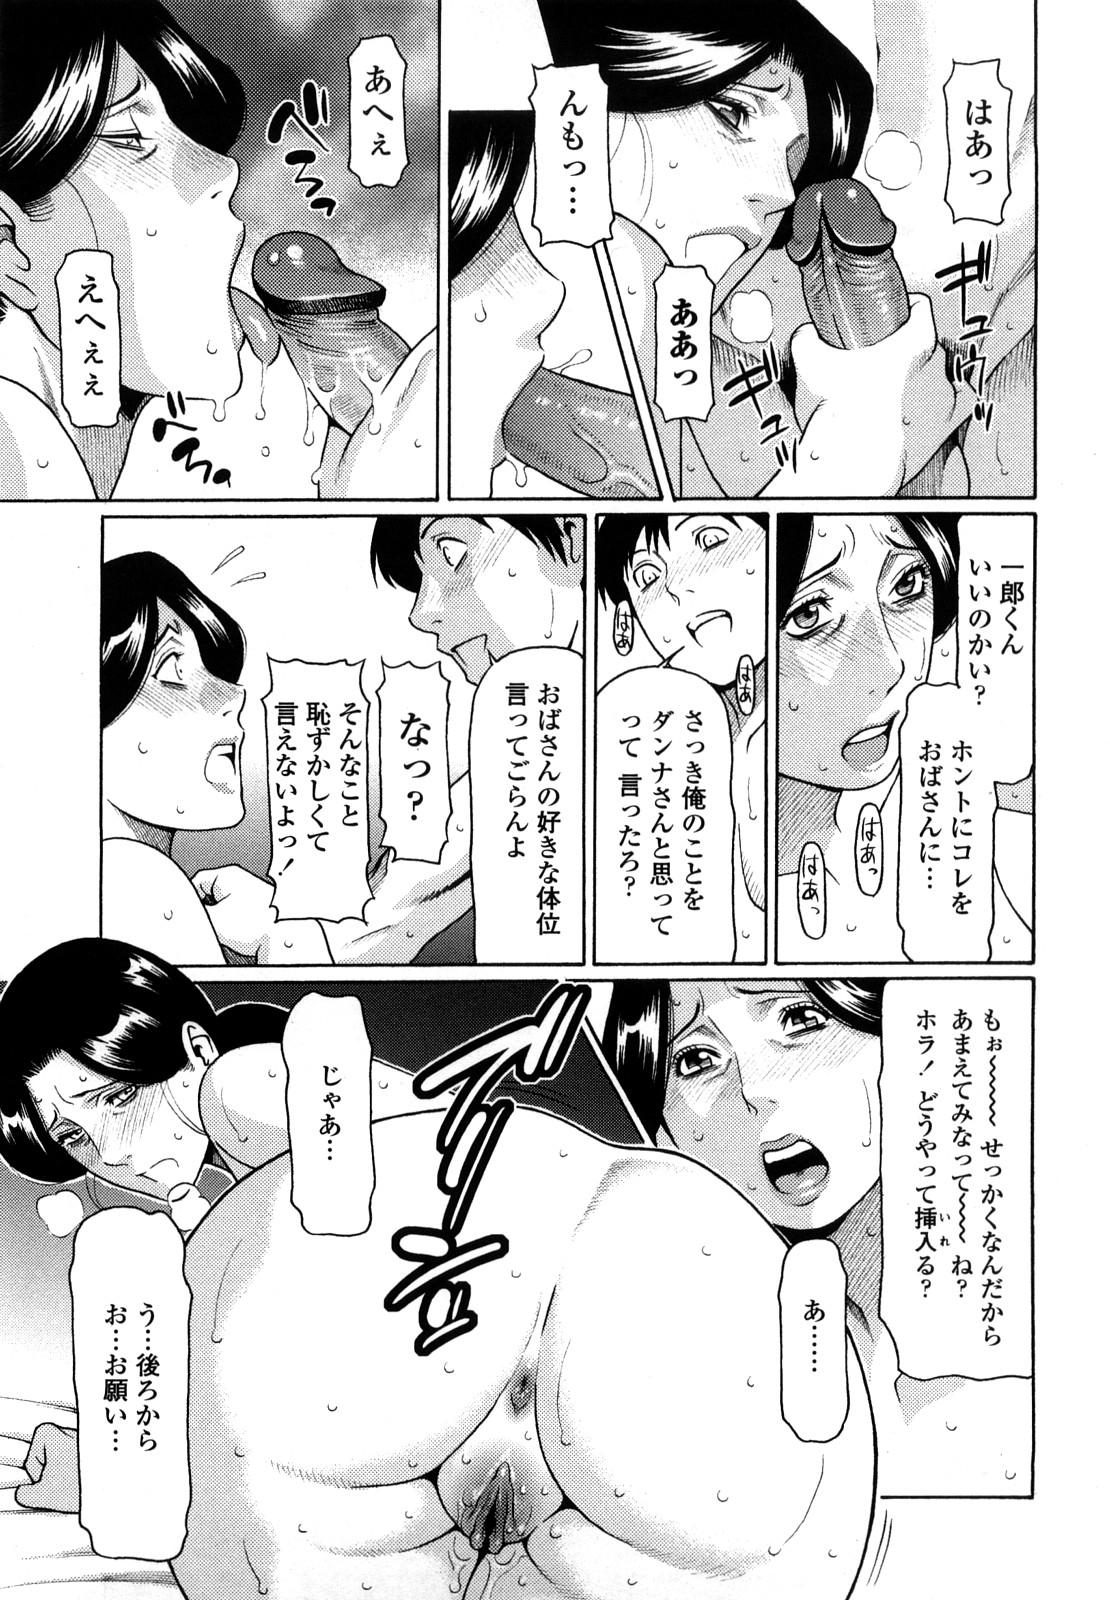 [Takasugi Kou] Kindan no Haha-Ana - Immorality Love-Hole [Decensored] 130